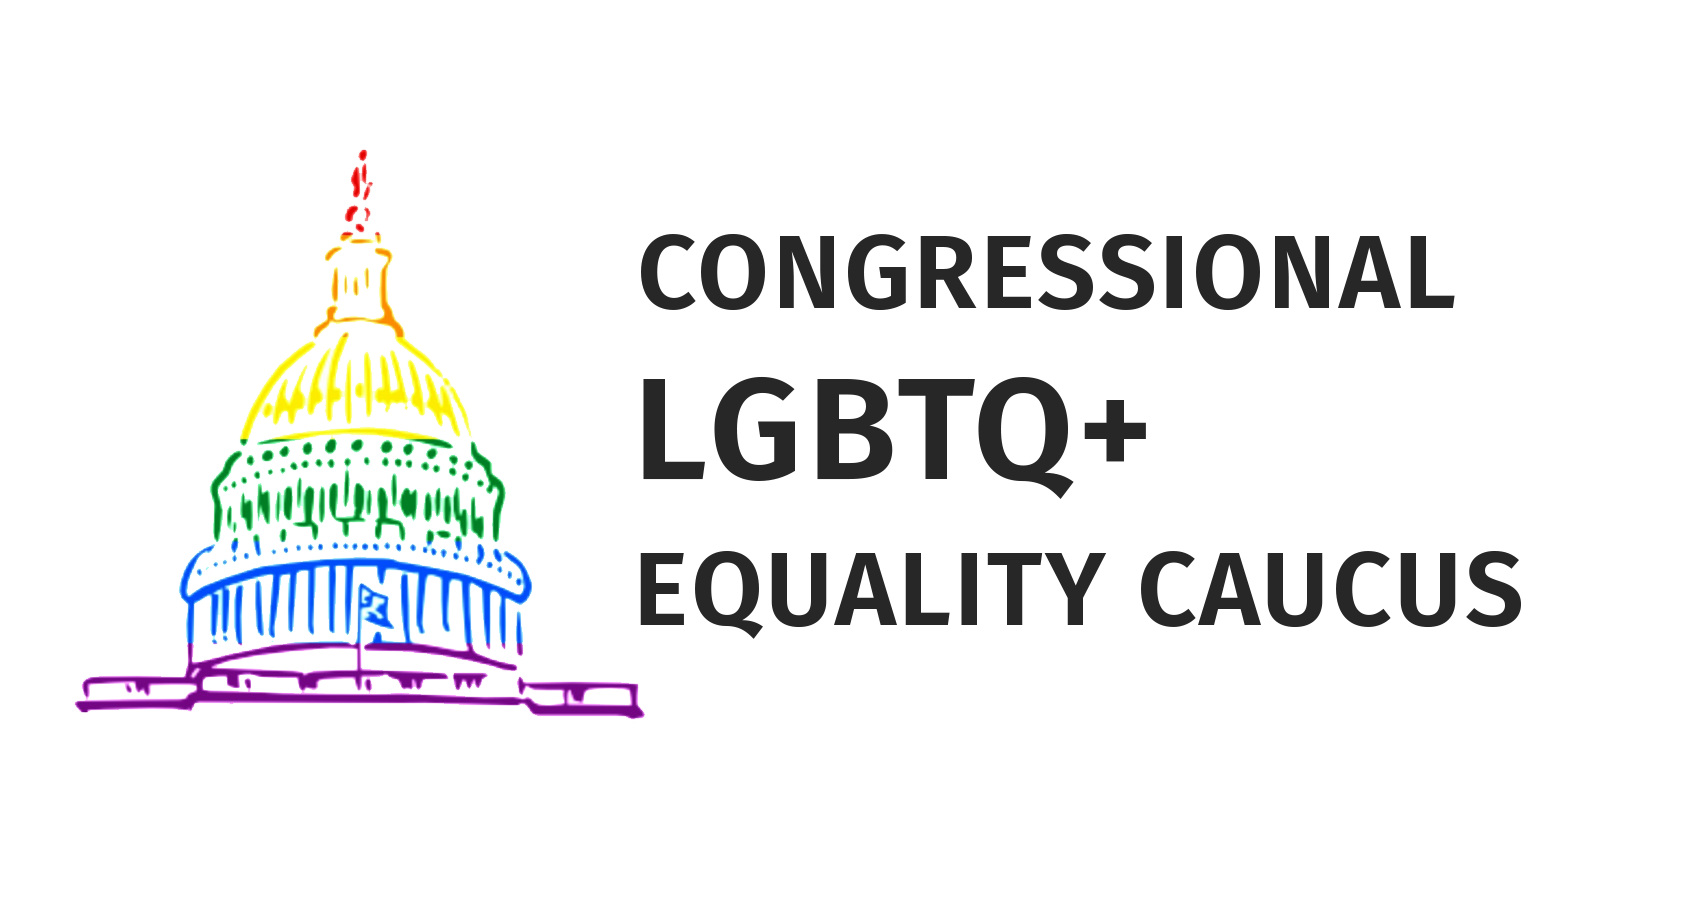 LGBTQ+ Equality Caucus